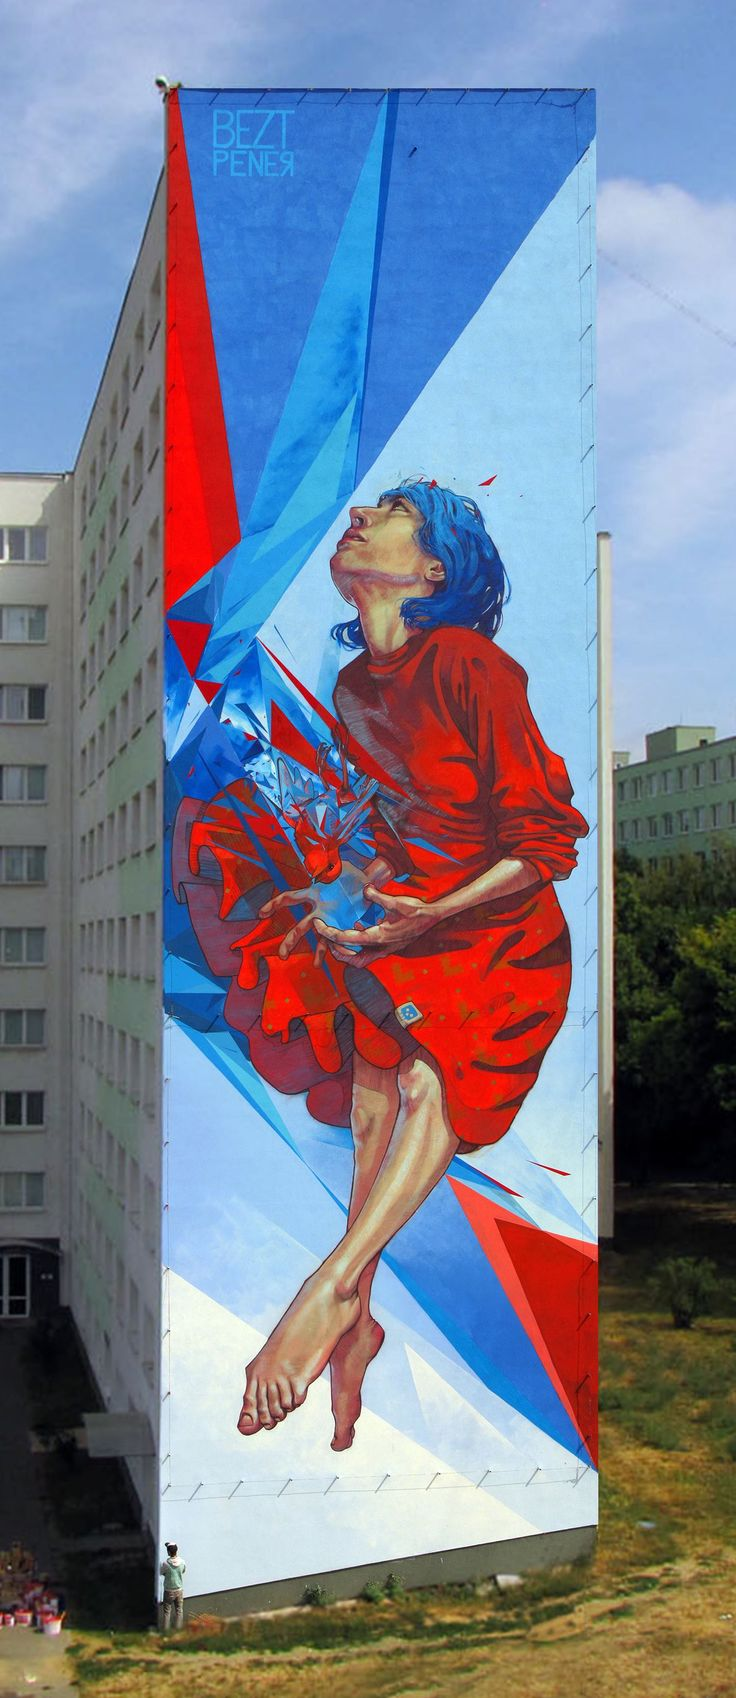 Surreal Murals by 'Etam Cru' Turn Drab Facades into Eye-Popping Imagery   http://www.thisiscolossal.com/2014/01/etam-cru-murals-2013/